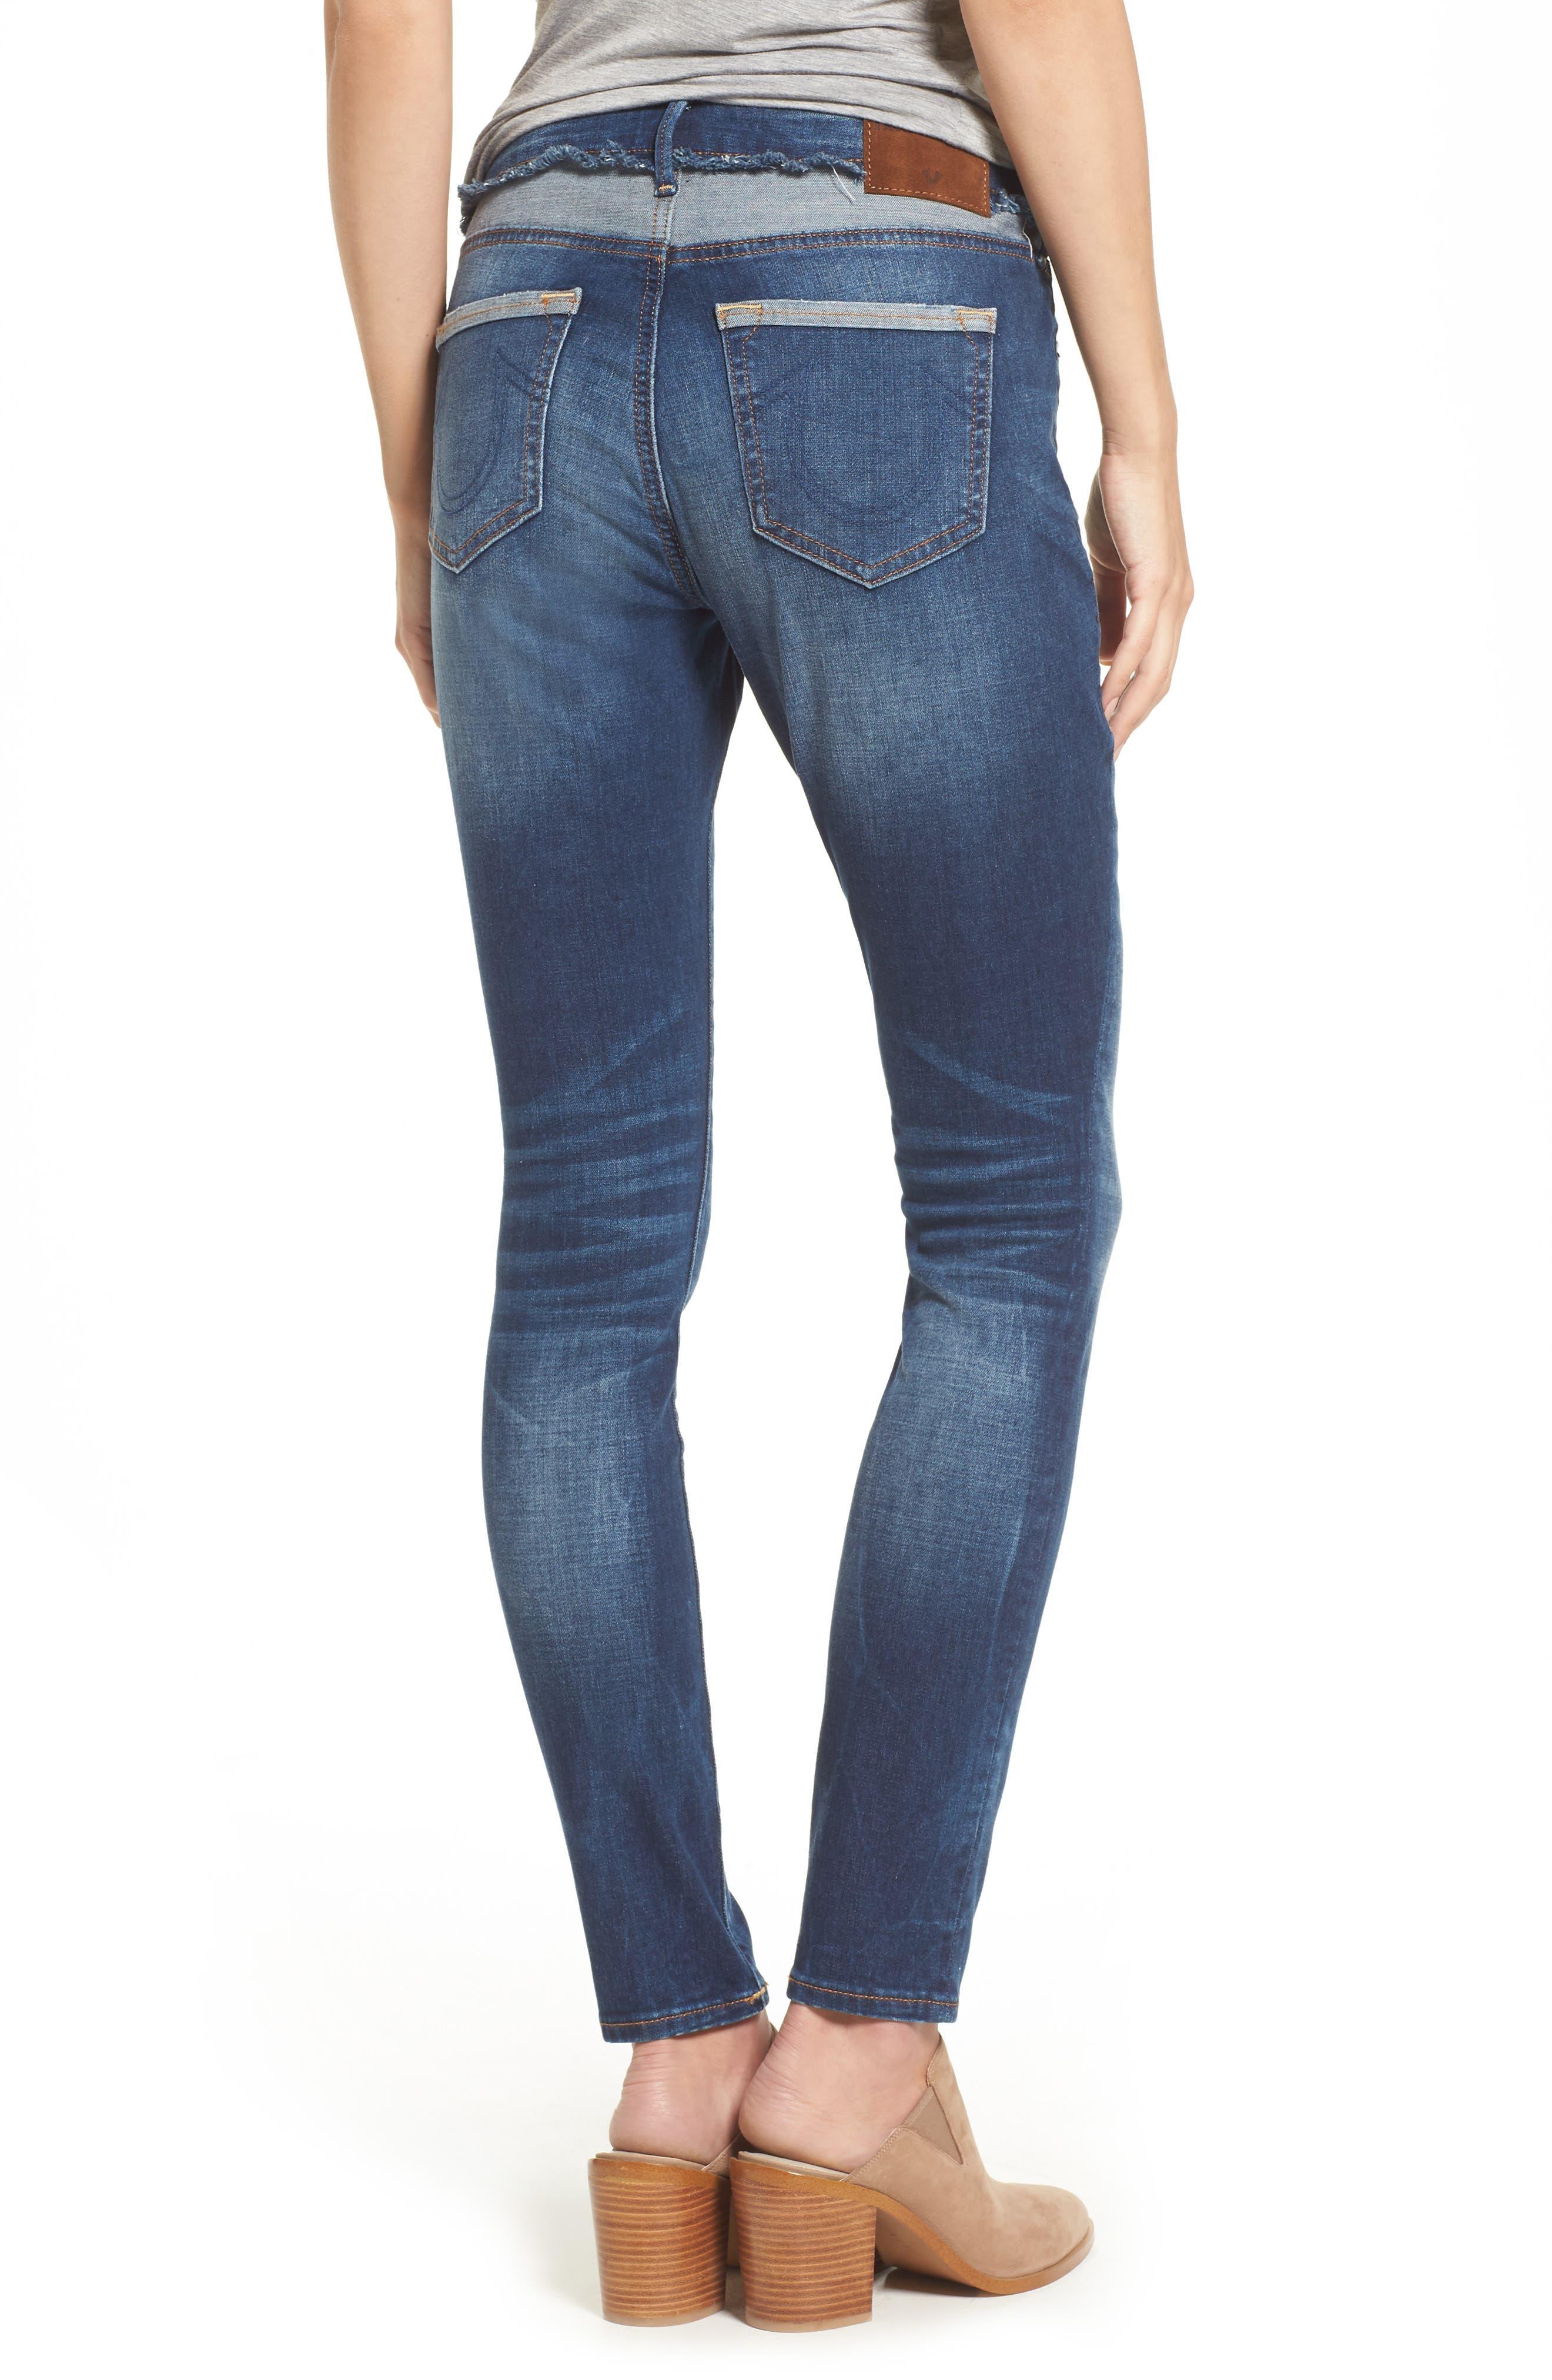 Alternate Image 2  - True Religion Brand Jeans Jennie Deconstructed Skinny Jeans (Broken Record)